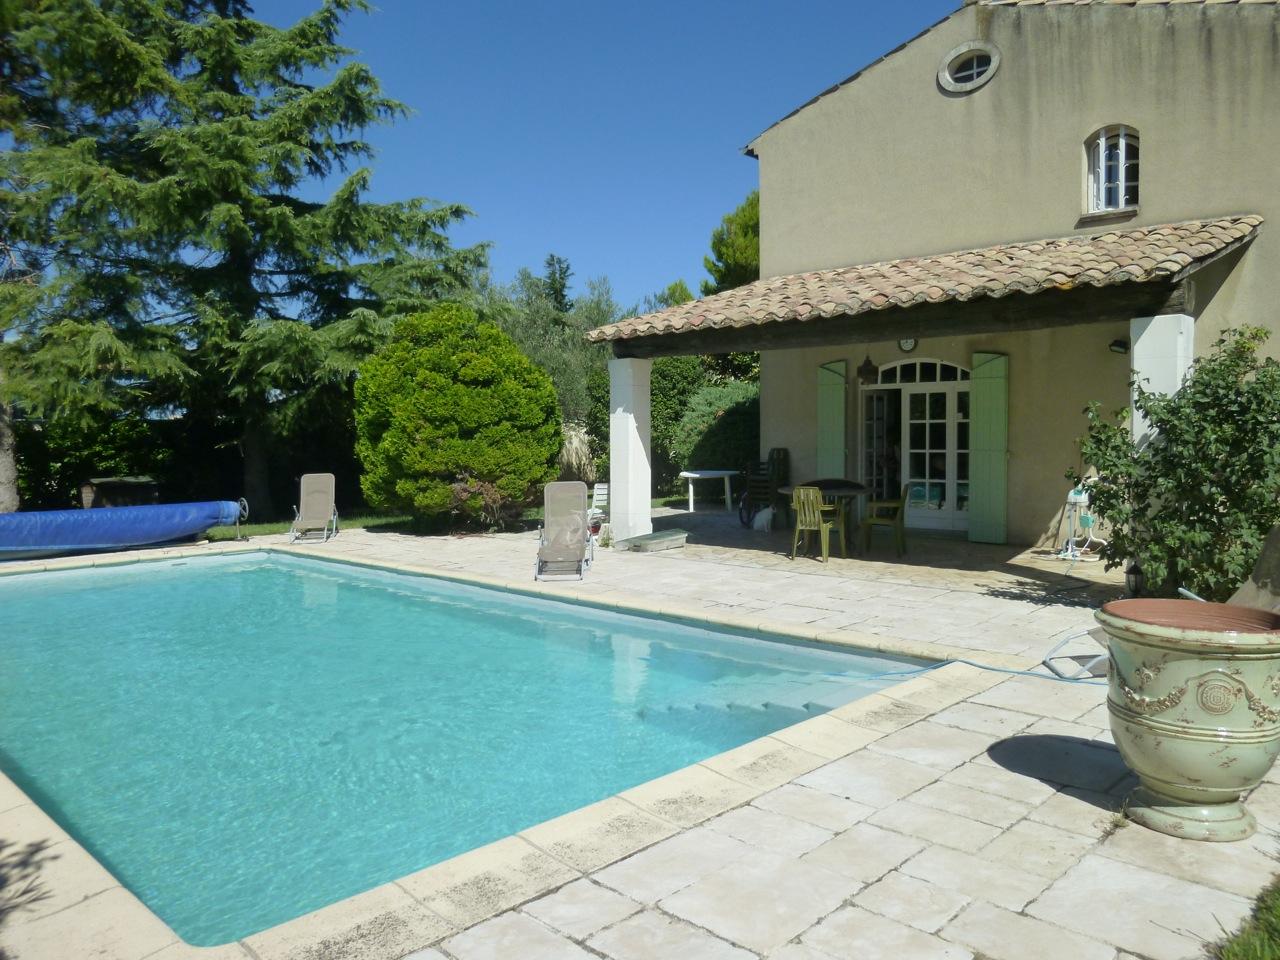 Vente villa piscine pierrelatte n dh69397 immobilier for Cash piscine pierrelatte